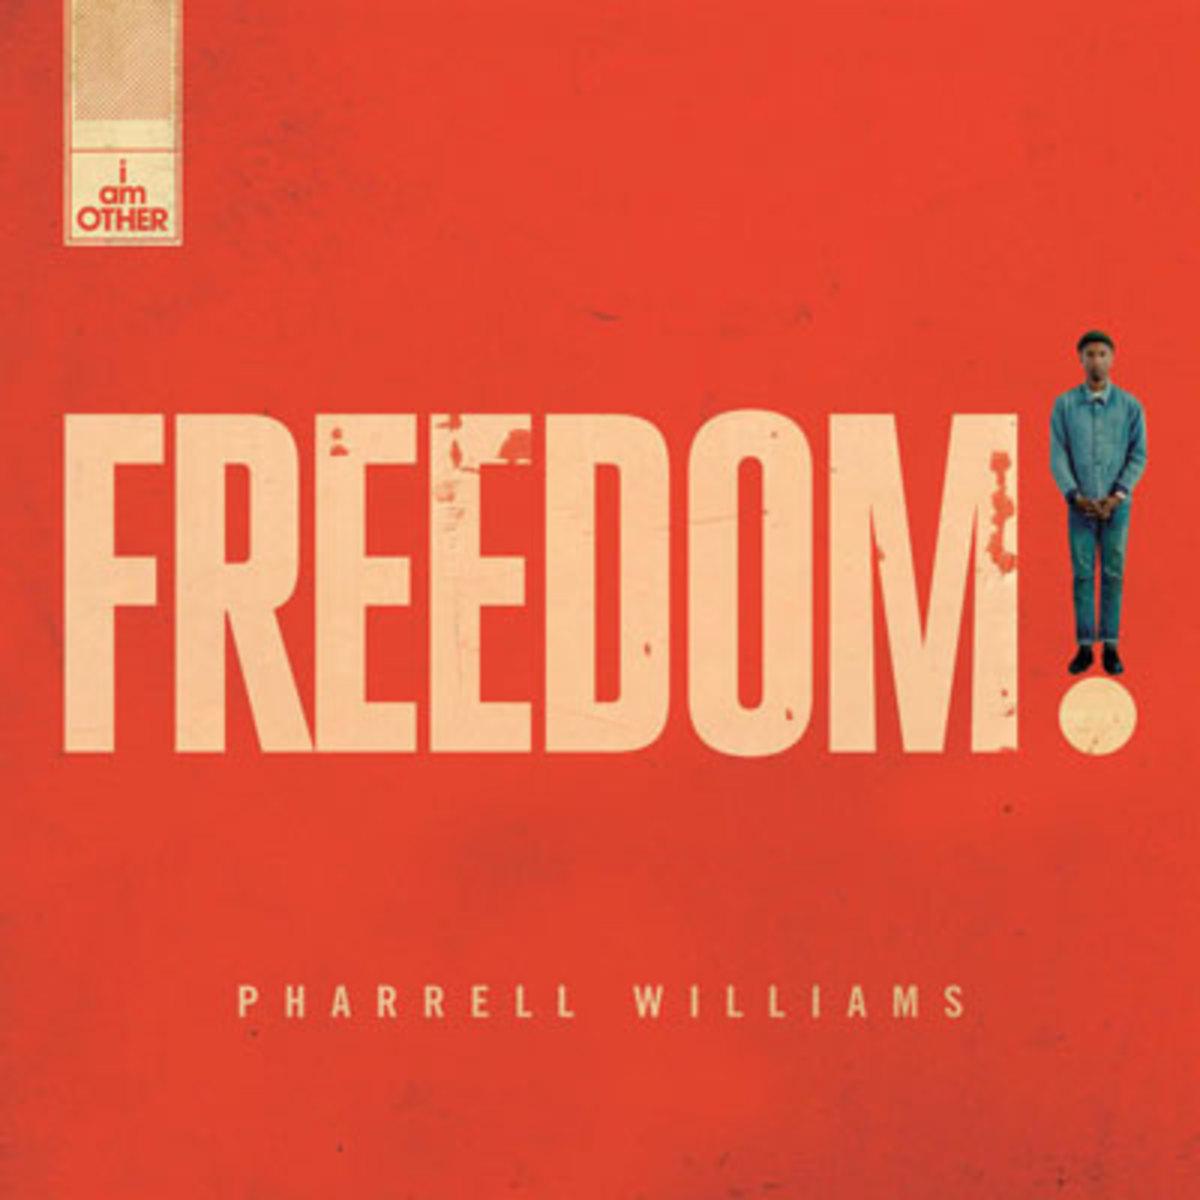 pharrell-williams-freedom.jpg